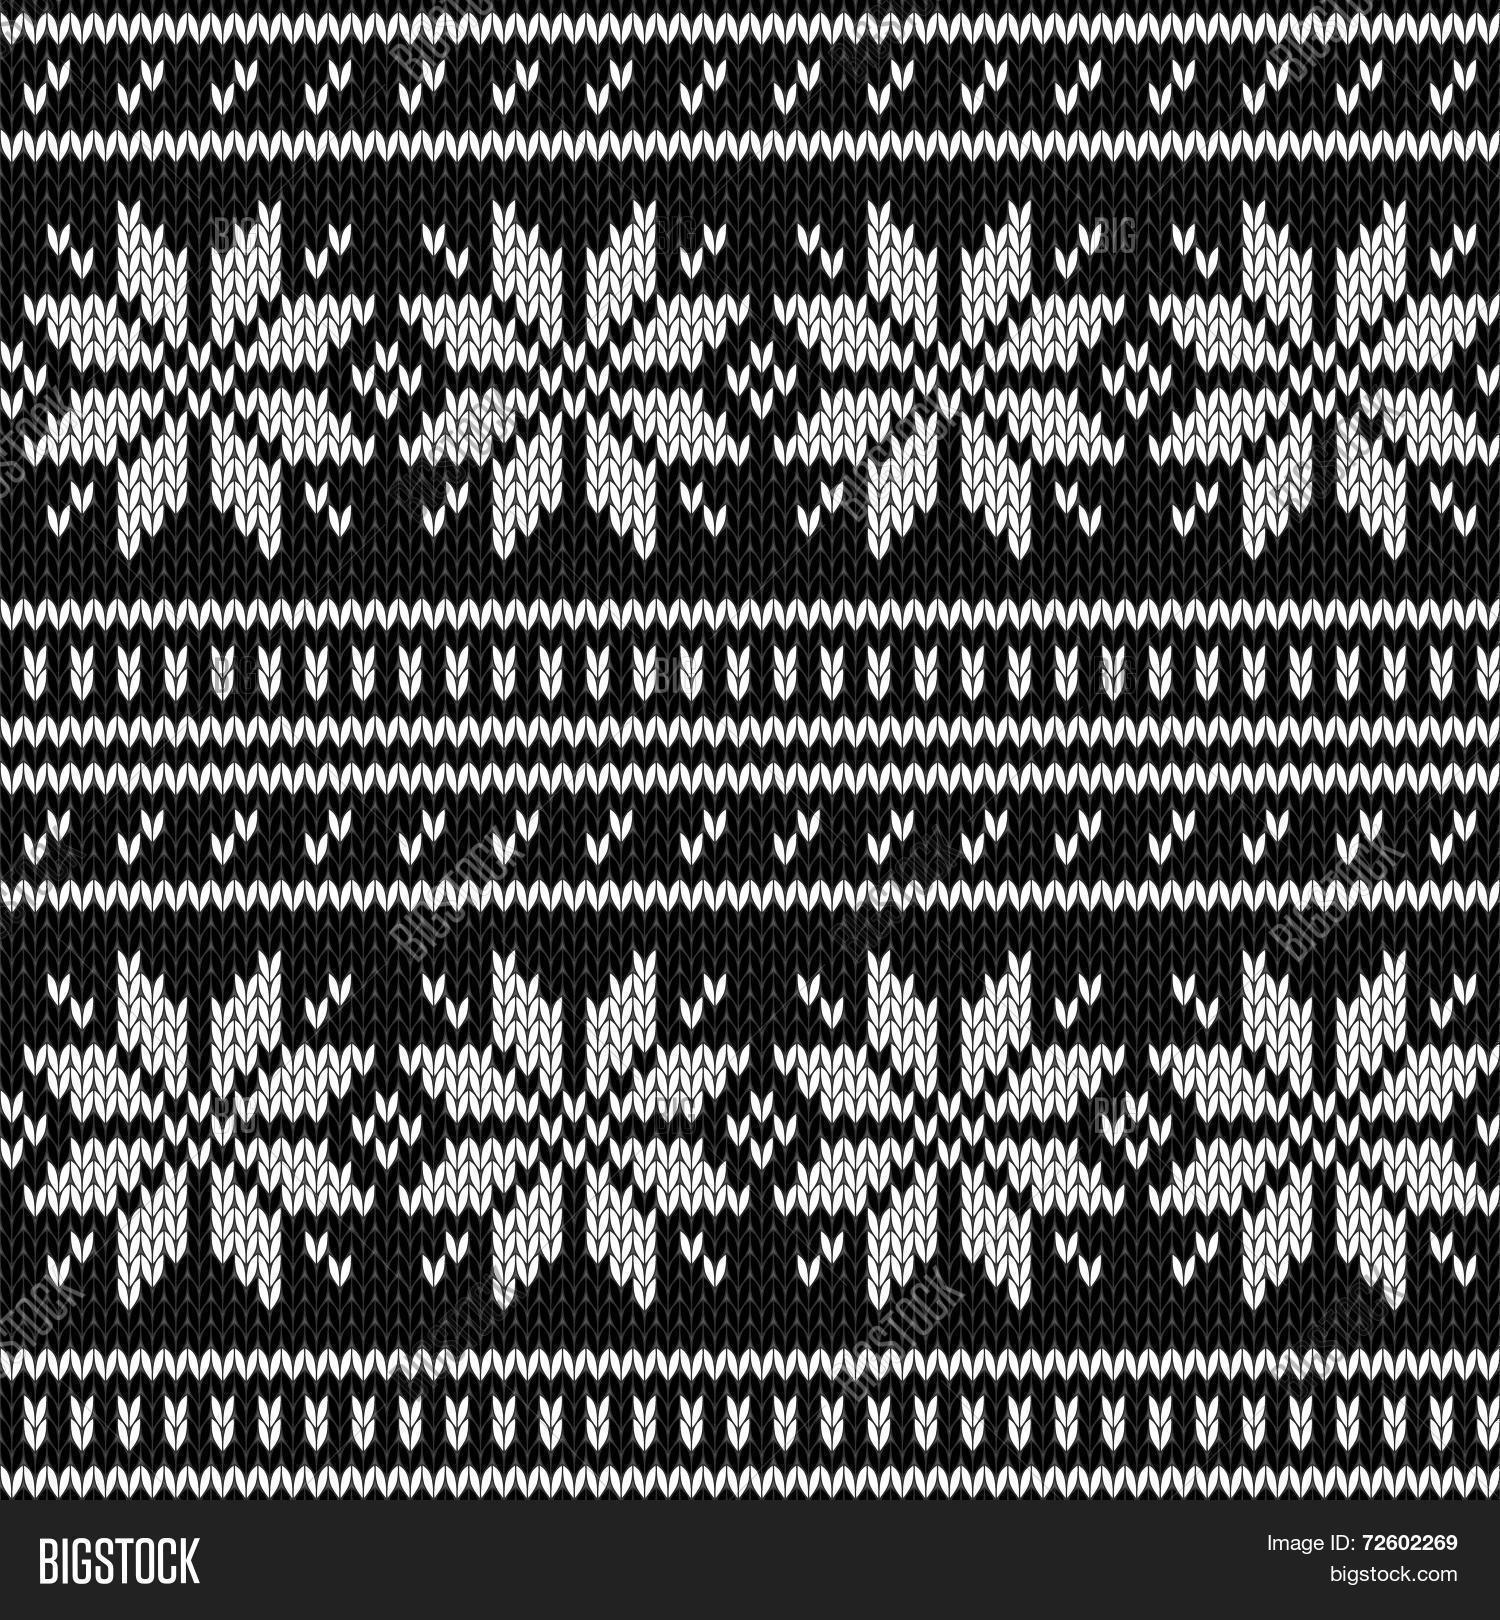 Scandinavian Knitted Vector & Photo (Free Trial) | Bigstock